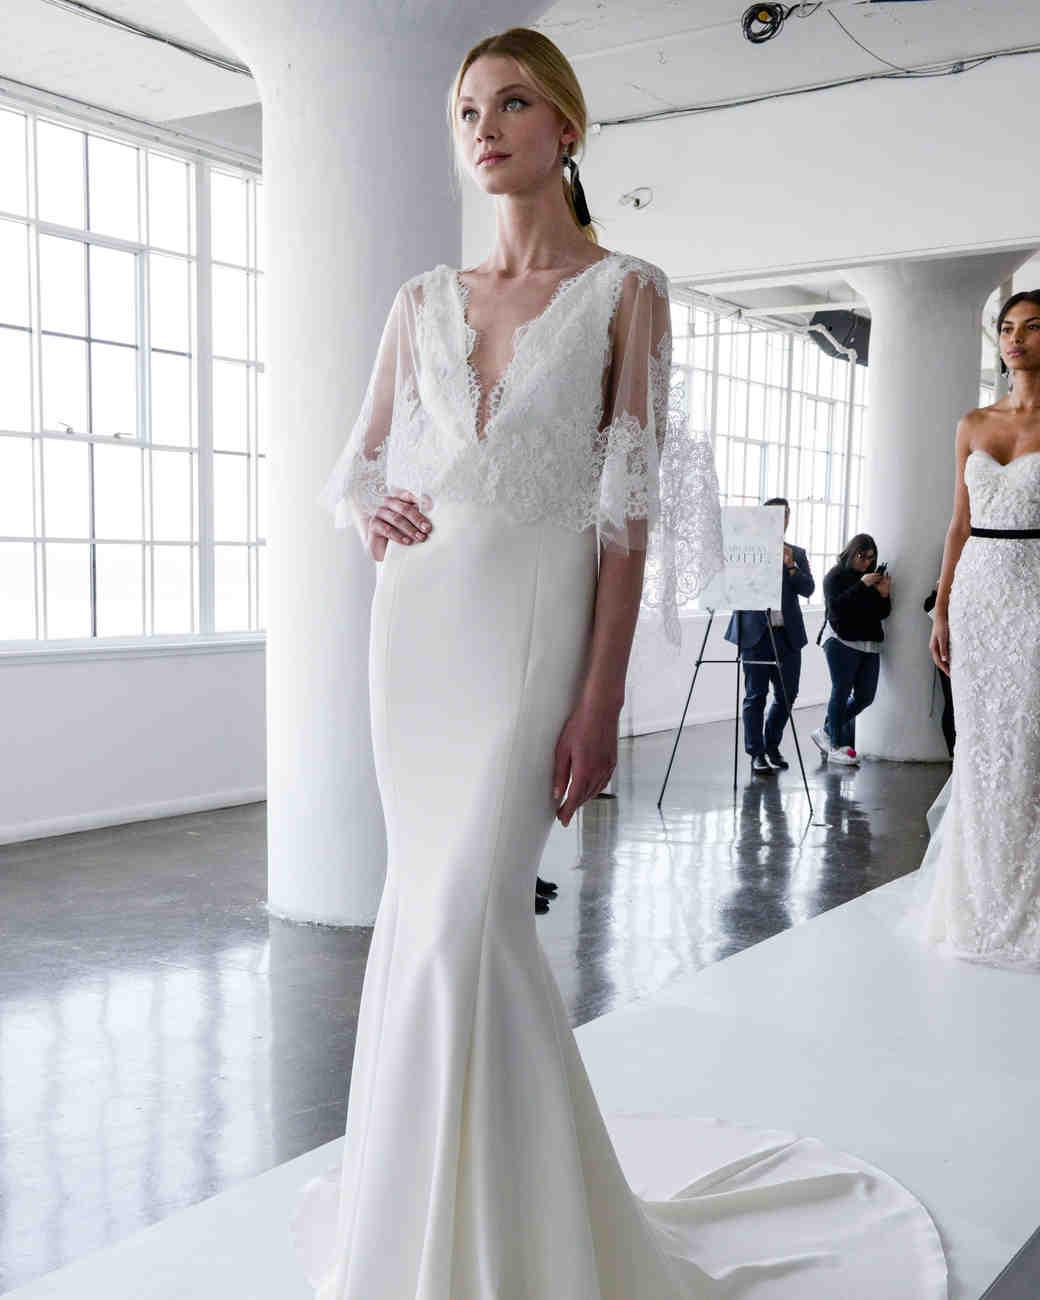 marchesa wedding dresses spring marchesa wedding dress marchesa spring wedding dress with lace bodice and v neckline